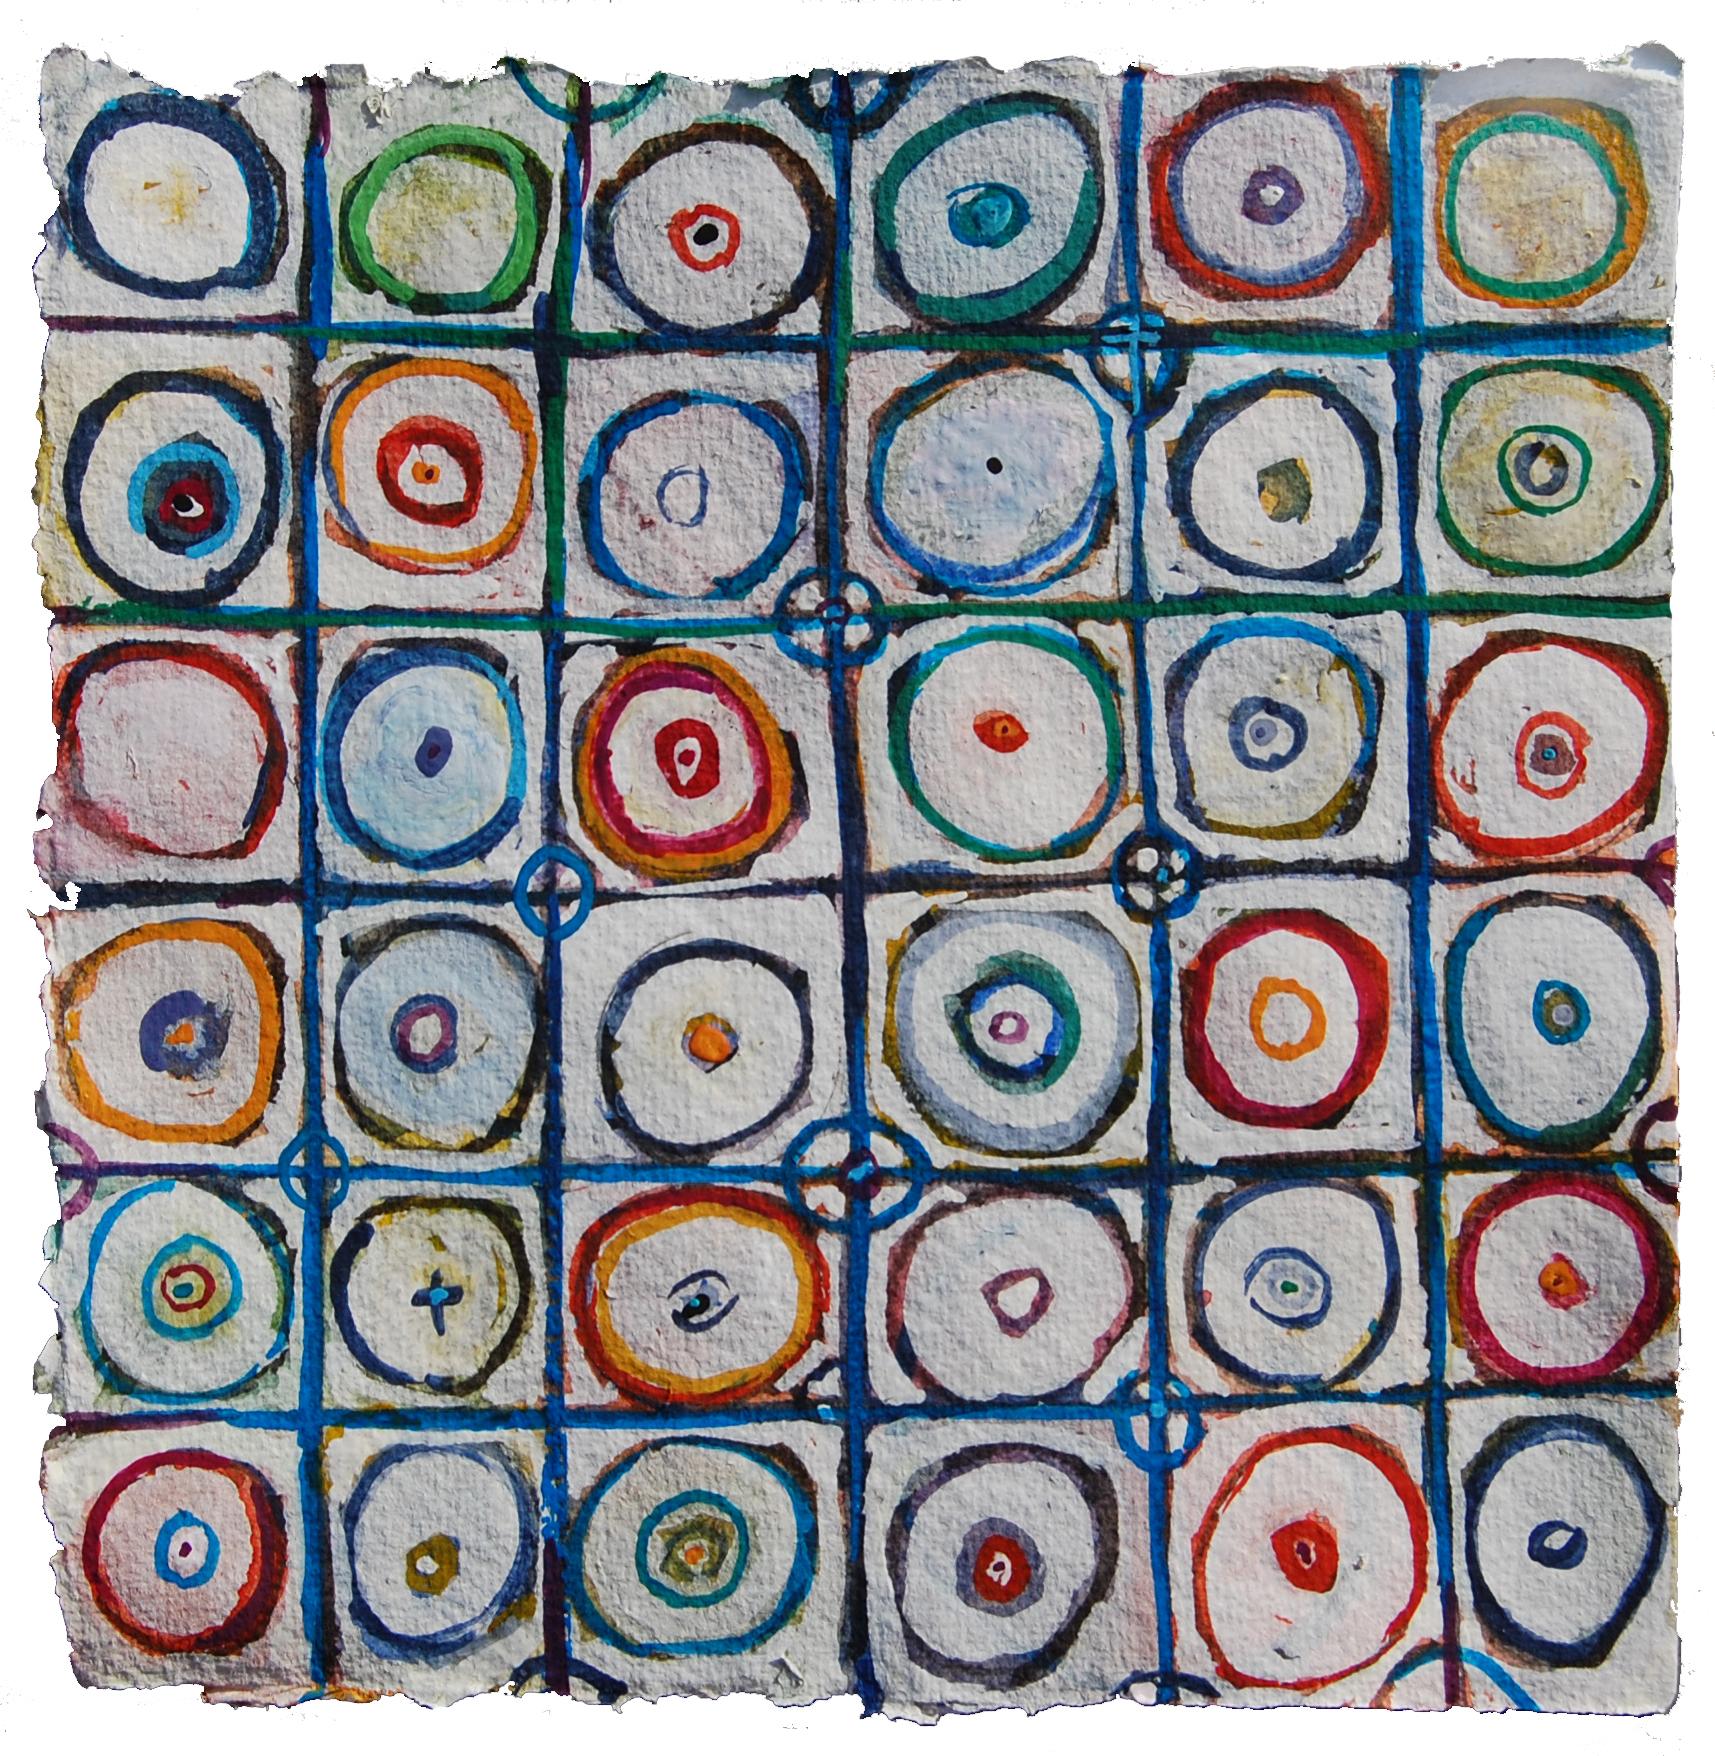 Untitled (Study of Circles 1)